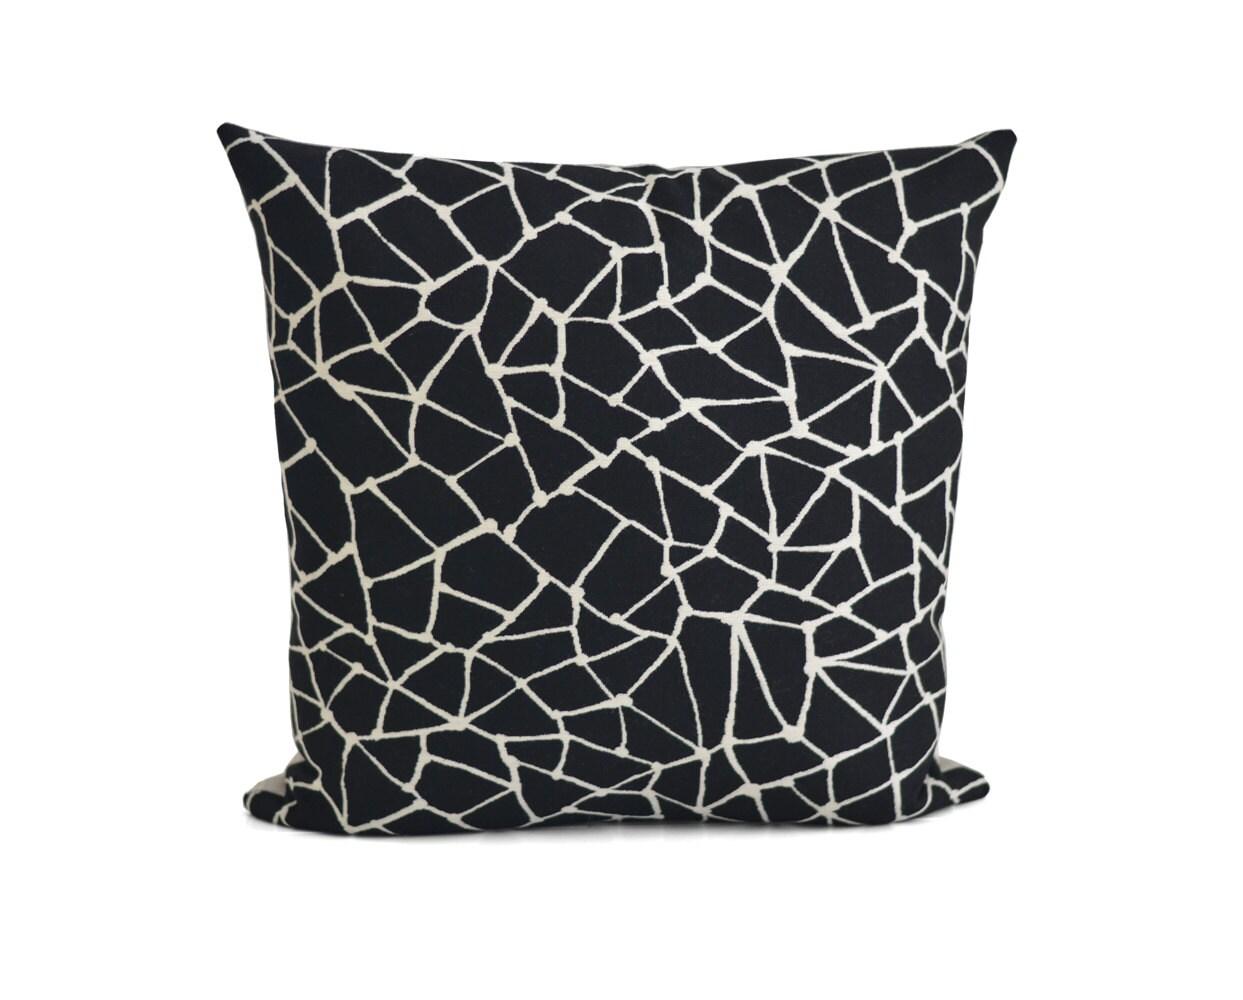 Black And White Decorative Throw Pillows : Black Off White Decorative Pillow Linen Throw Pillow